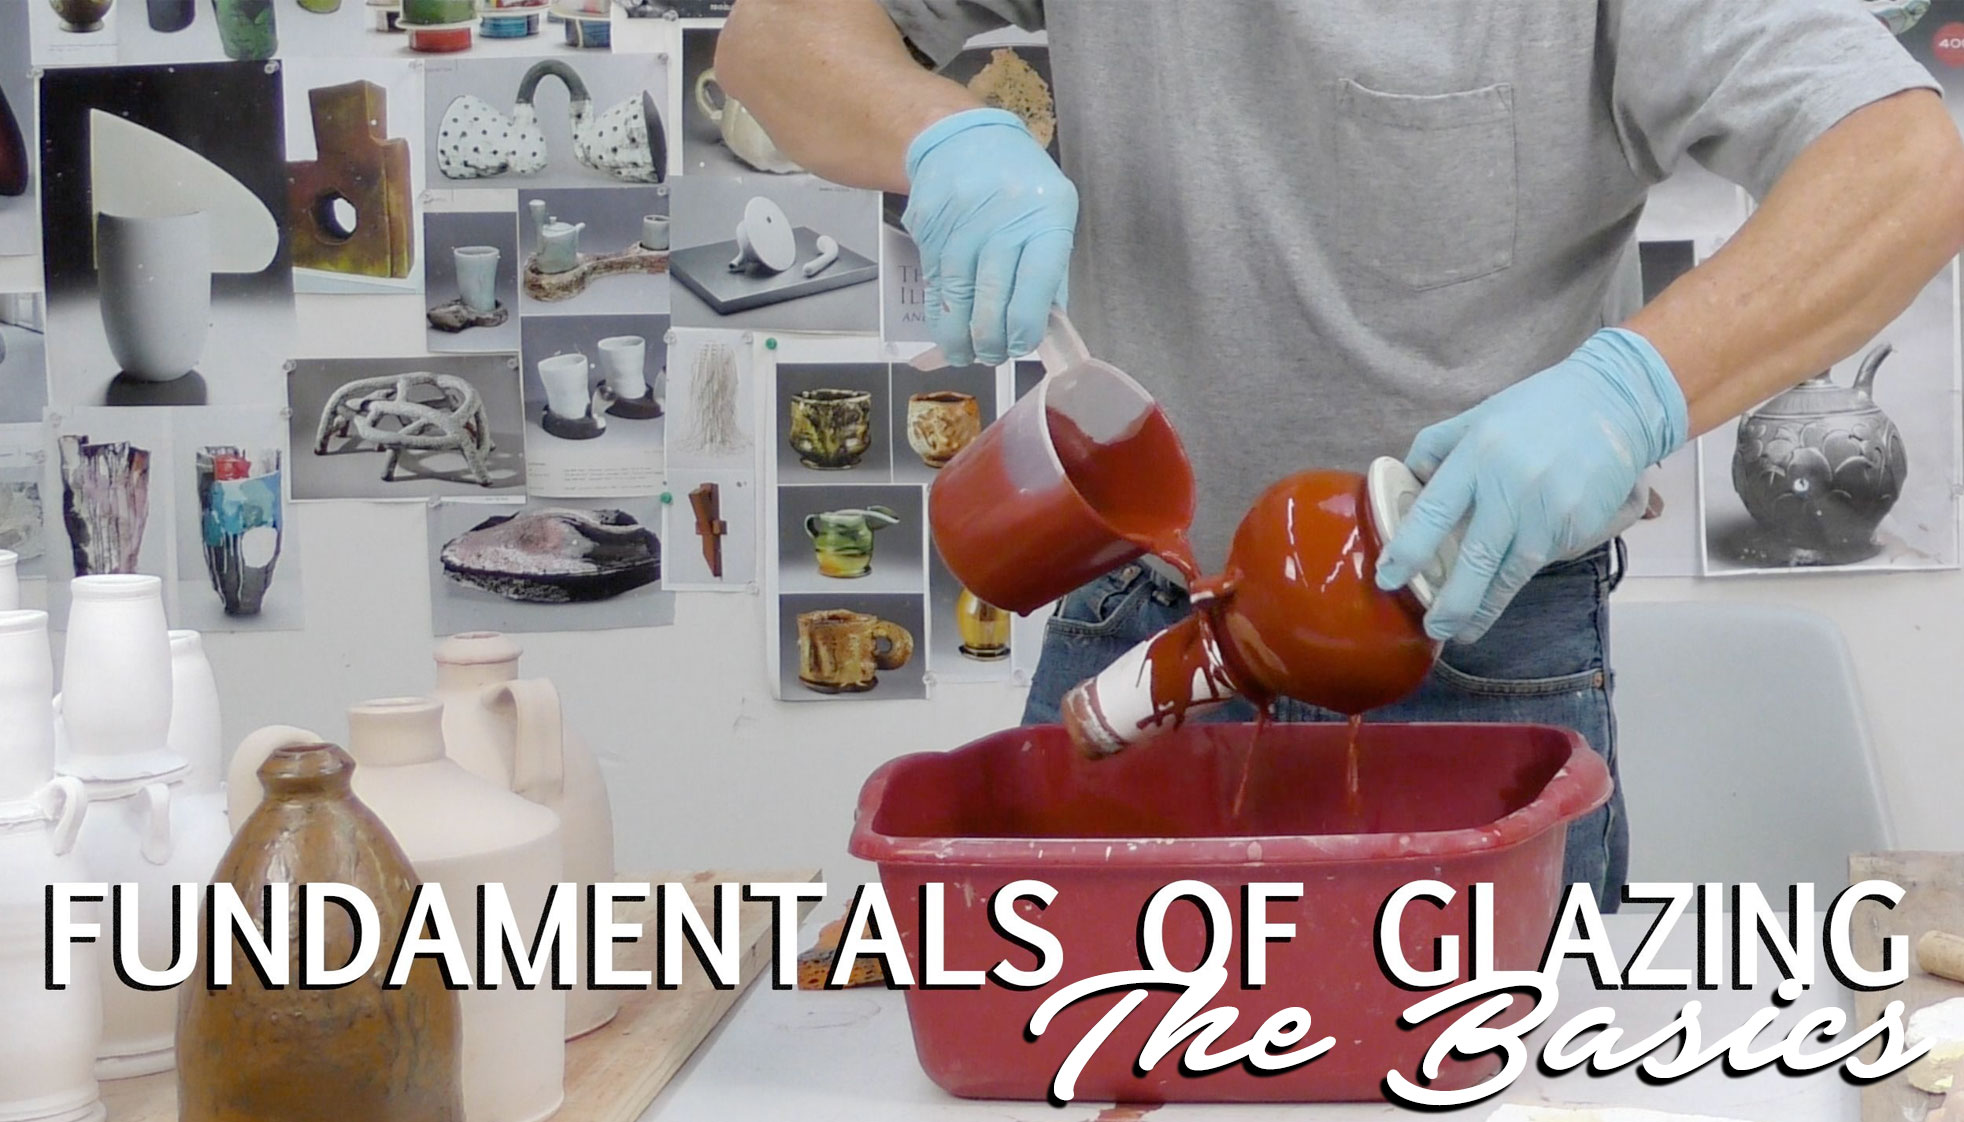 Fundamentals of Glazing